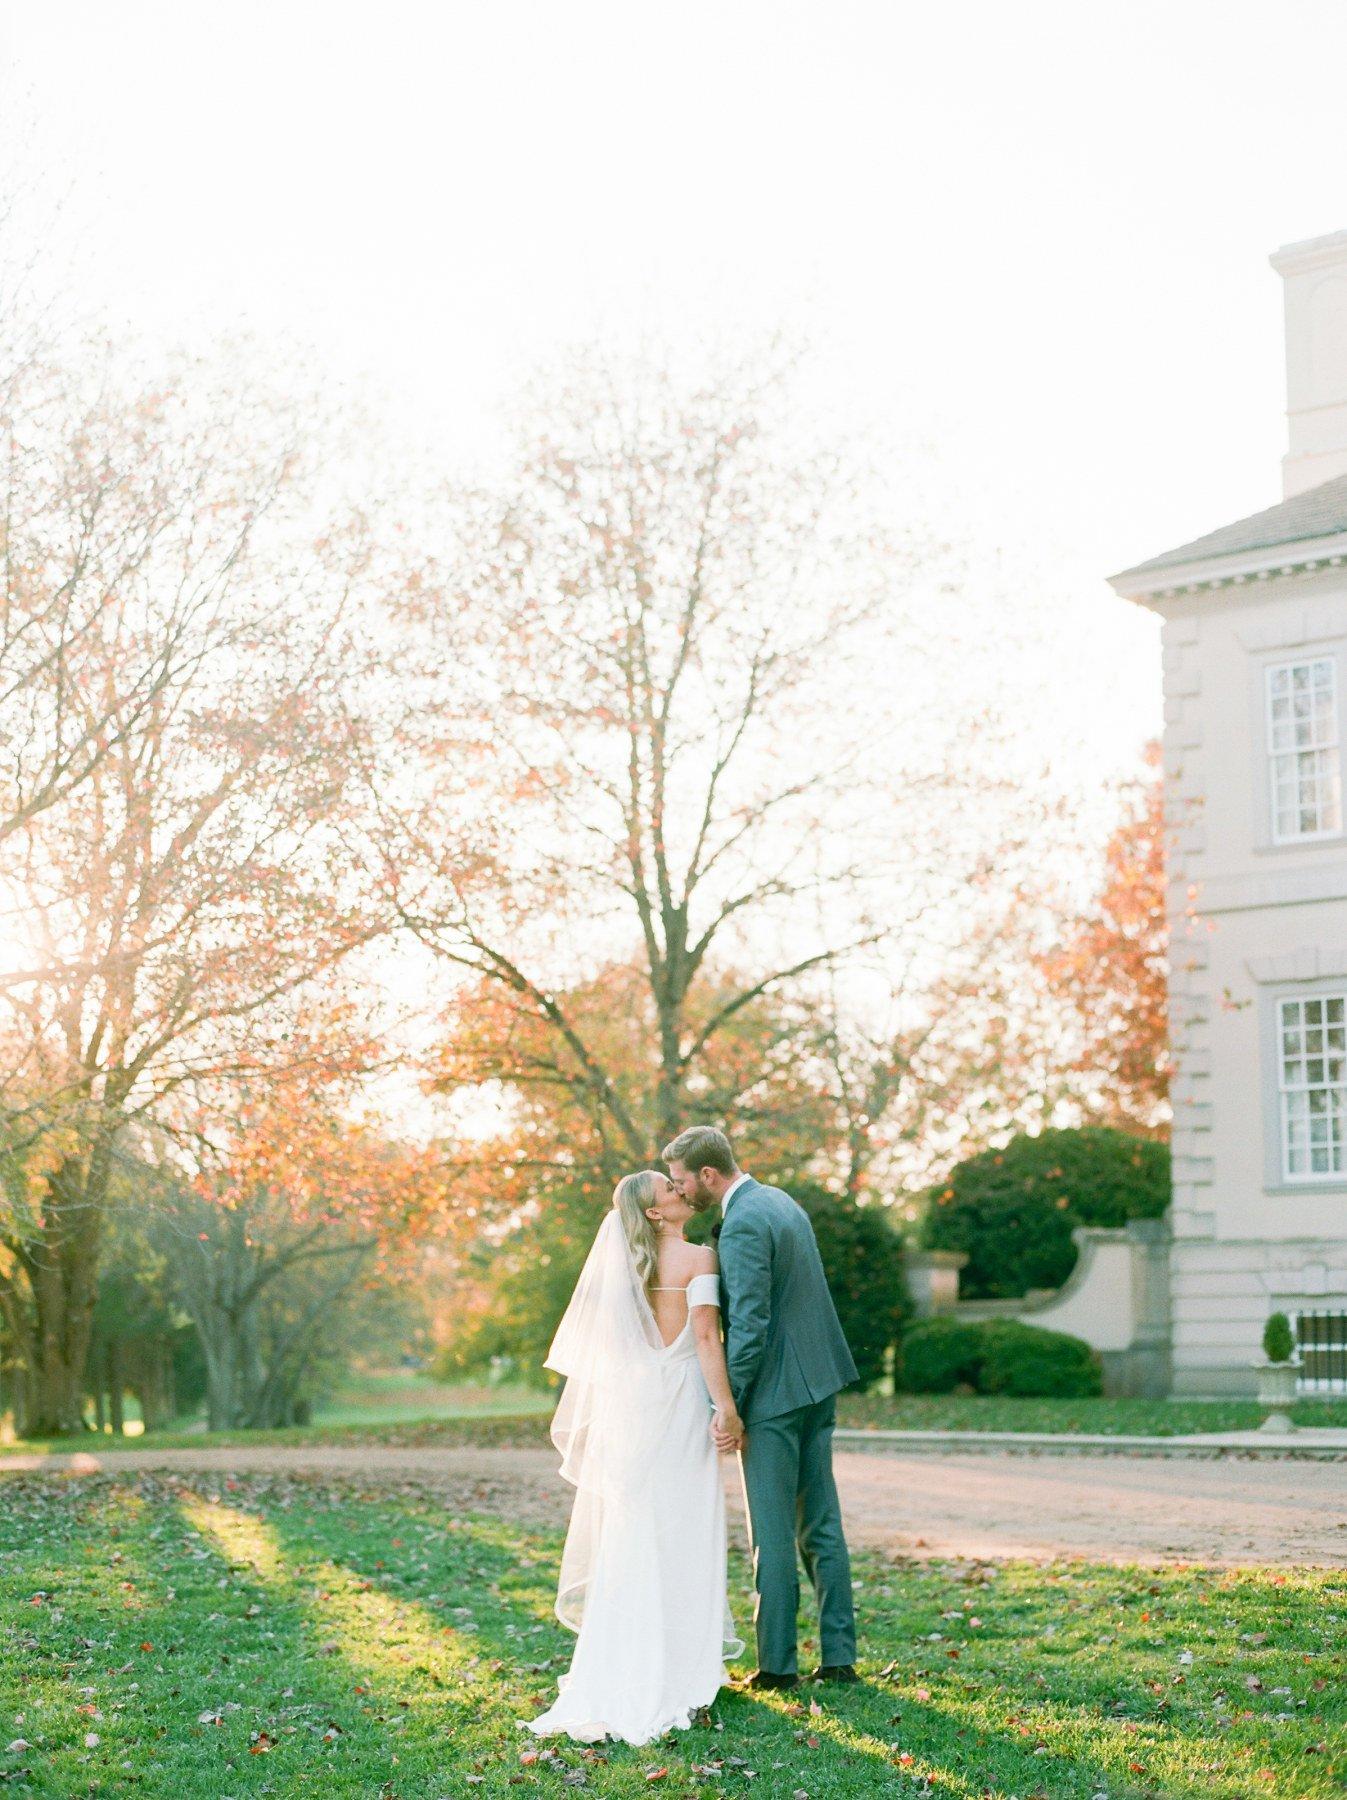 46Great_Marsh_Estates_Wedding_Anne_Kelley_Events_Astrid_Photography146486030009-2